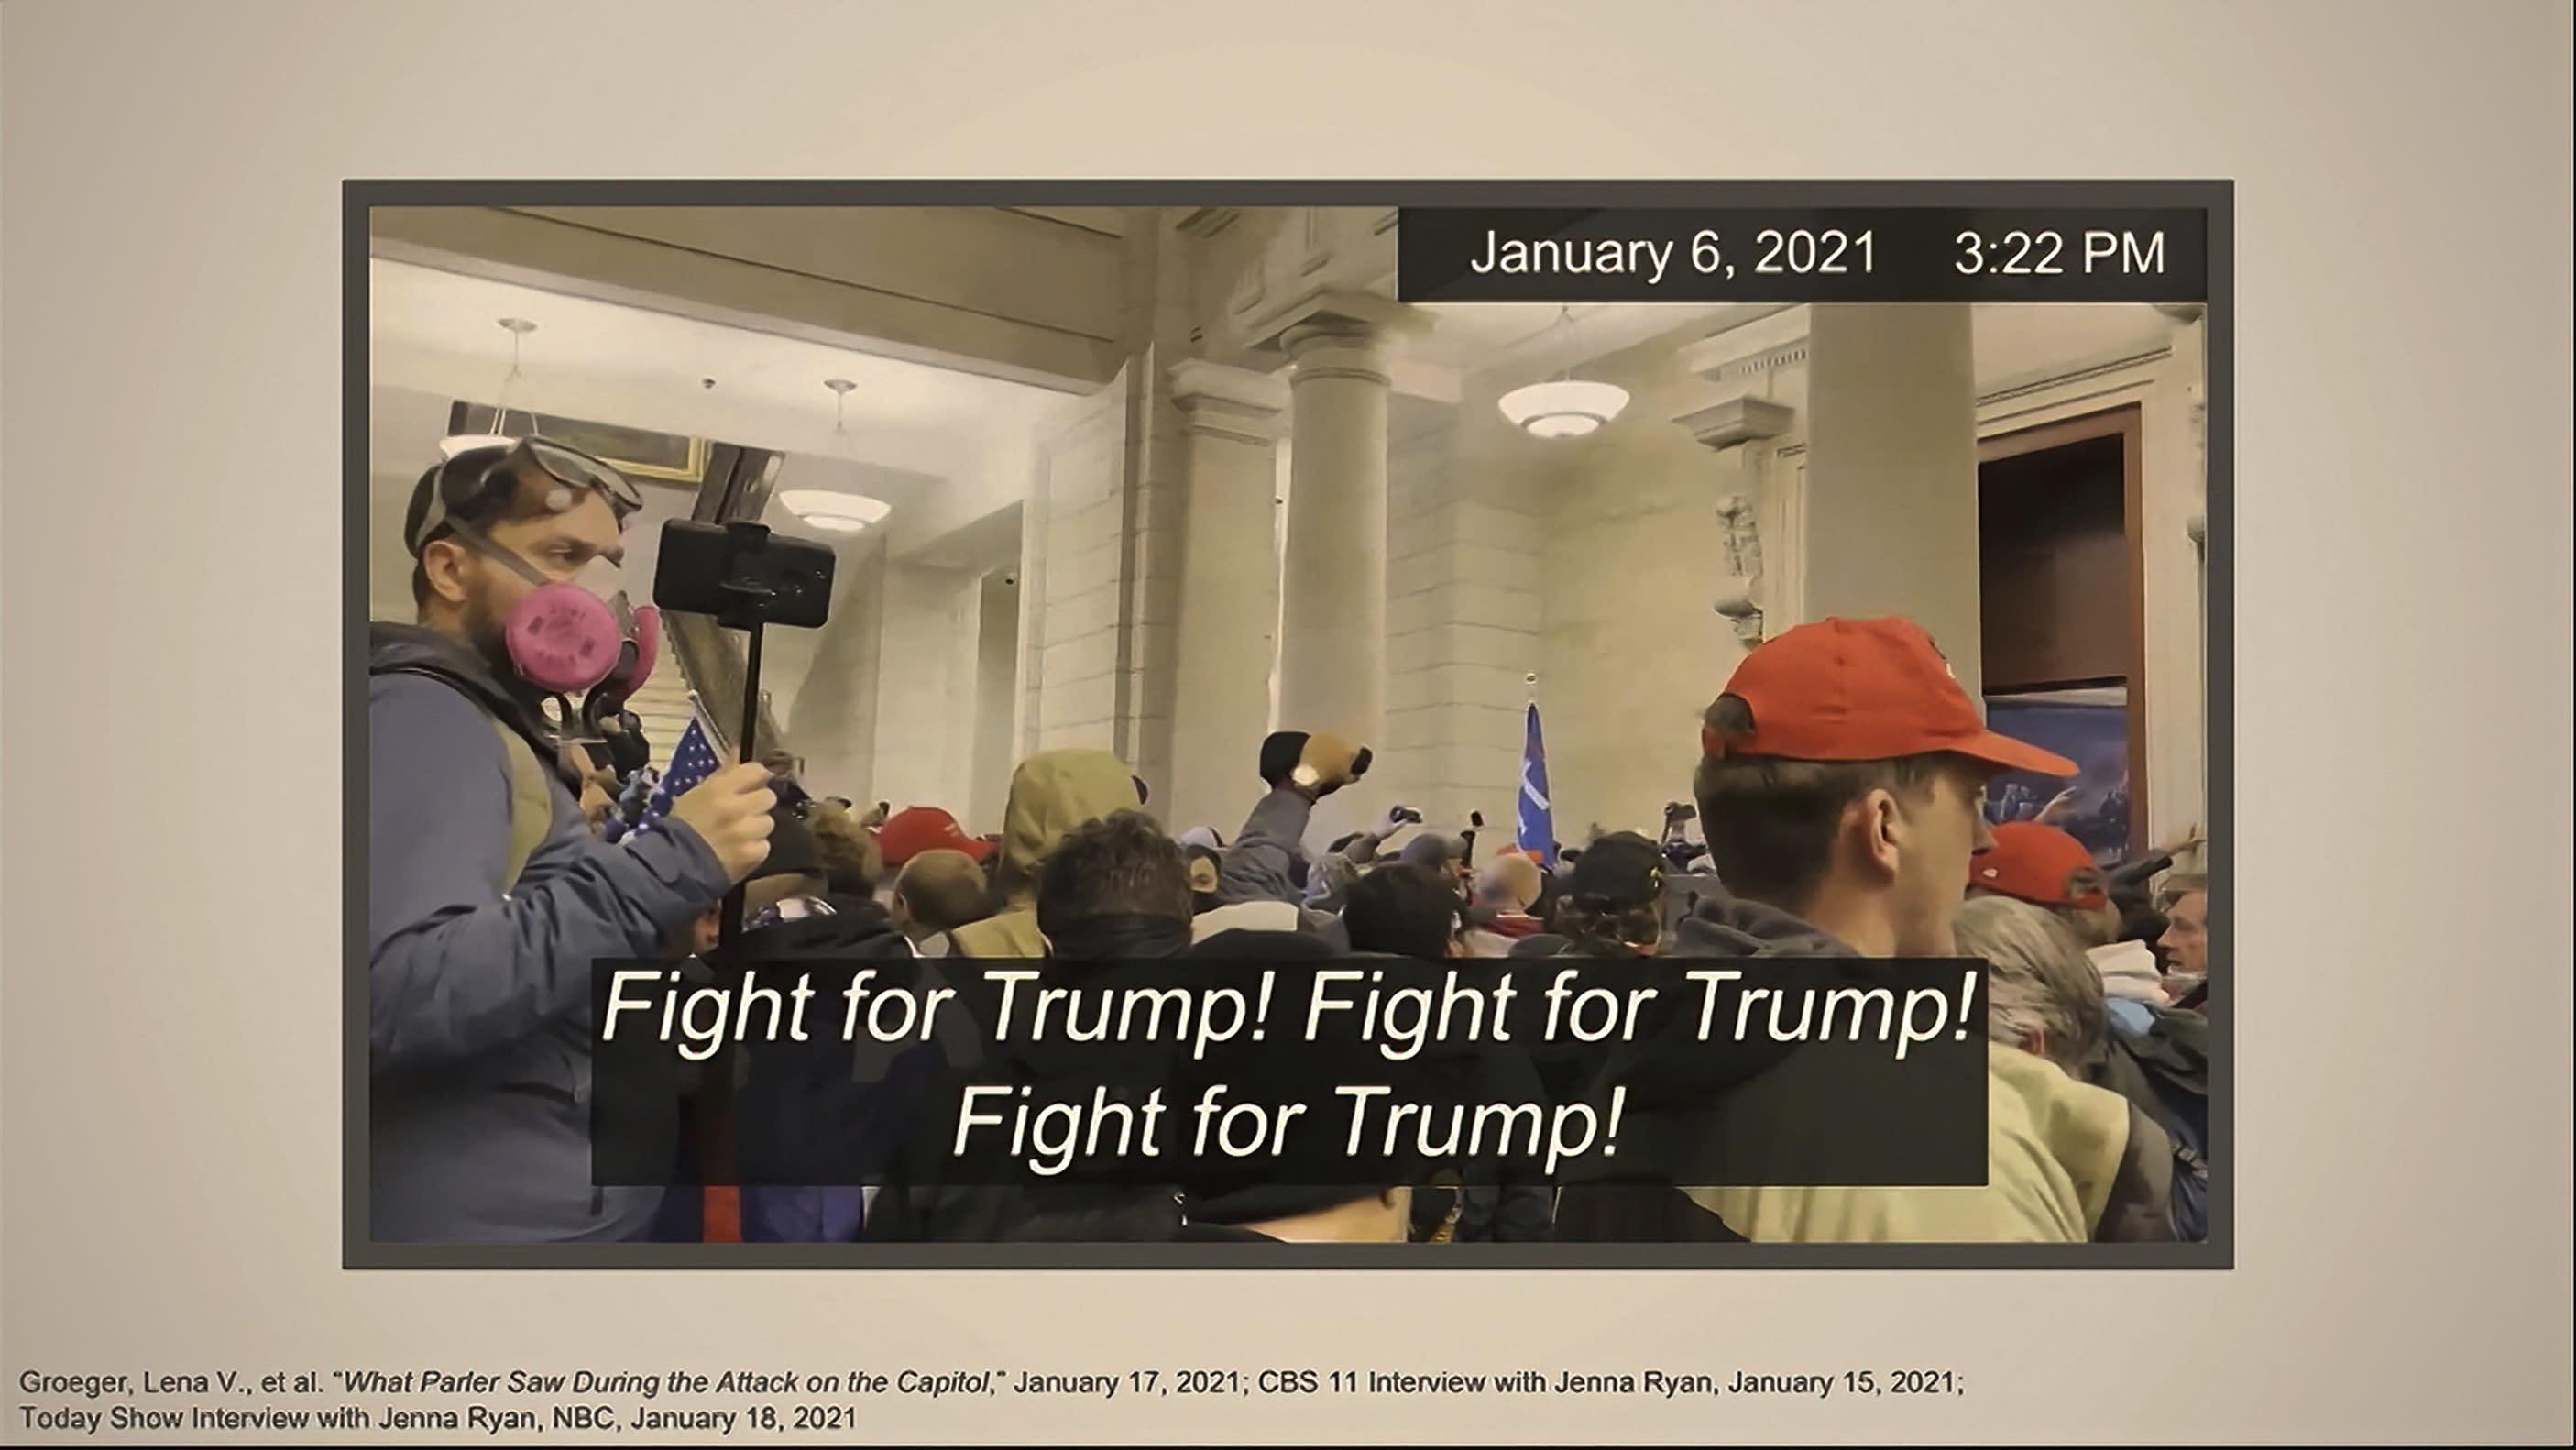 Trial highlights: Harrowing footage, focus on Trump's words